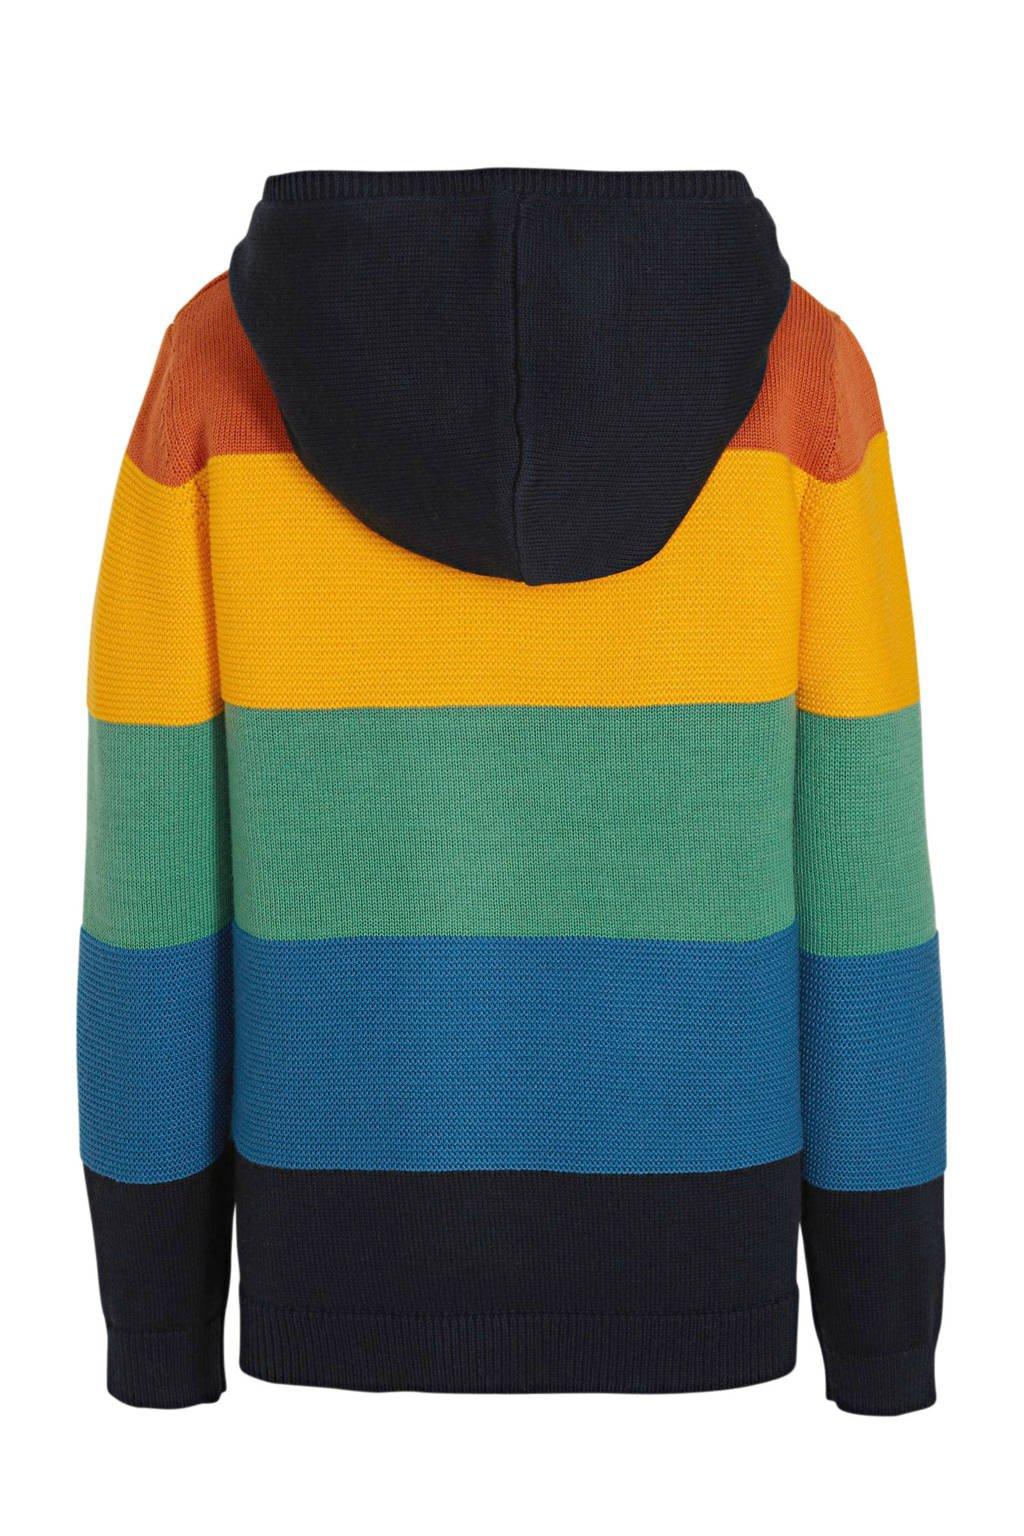 s.Oliver gestreepte trui marine/multicolor, Marine/multicolor